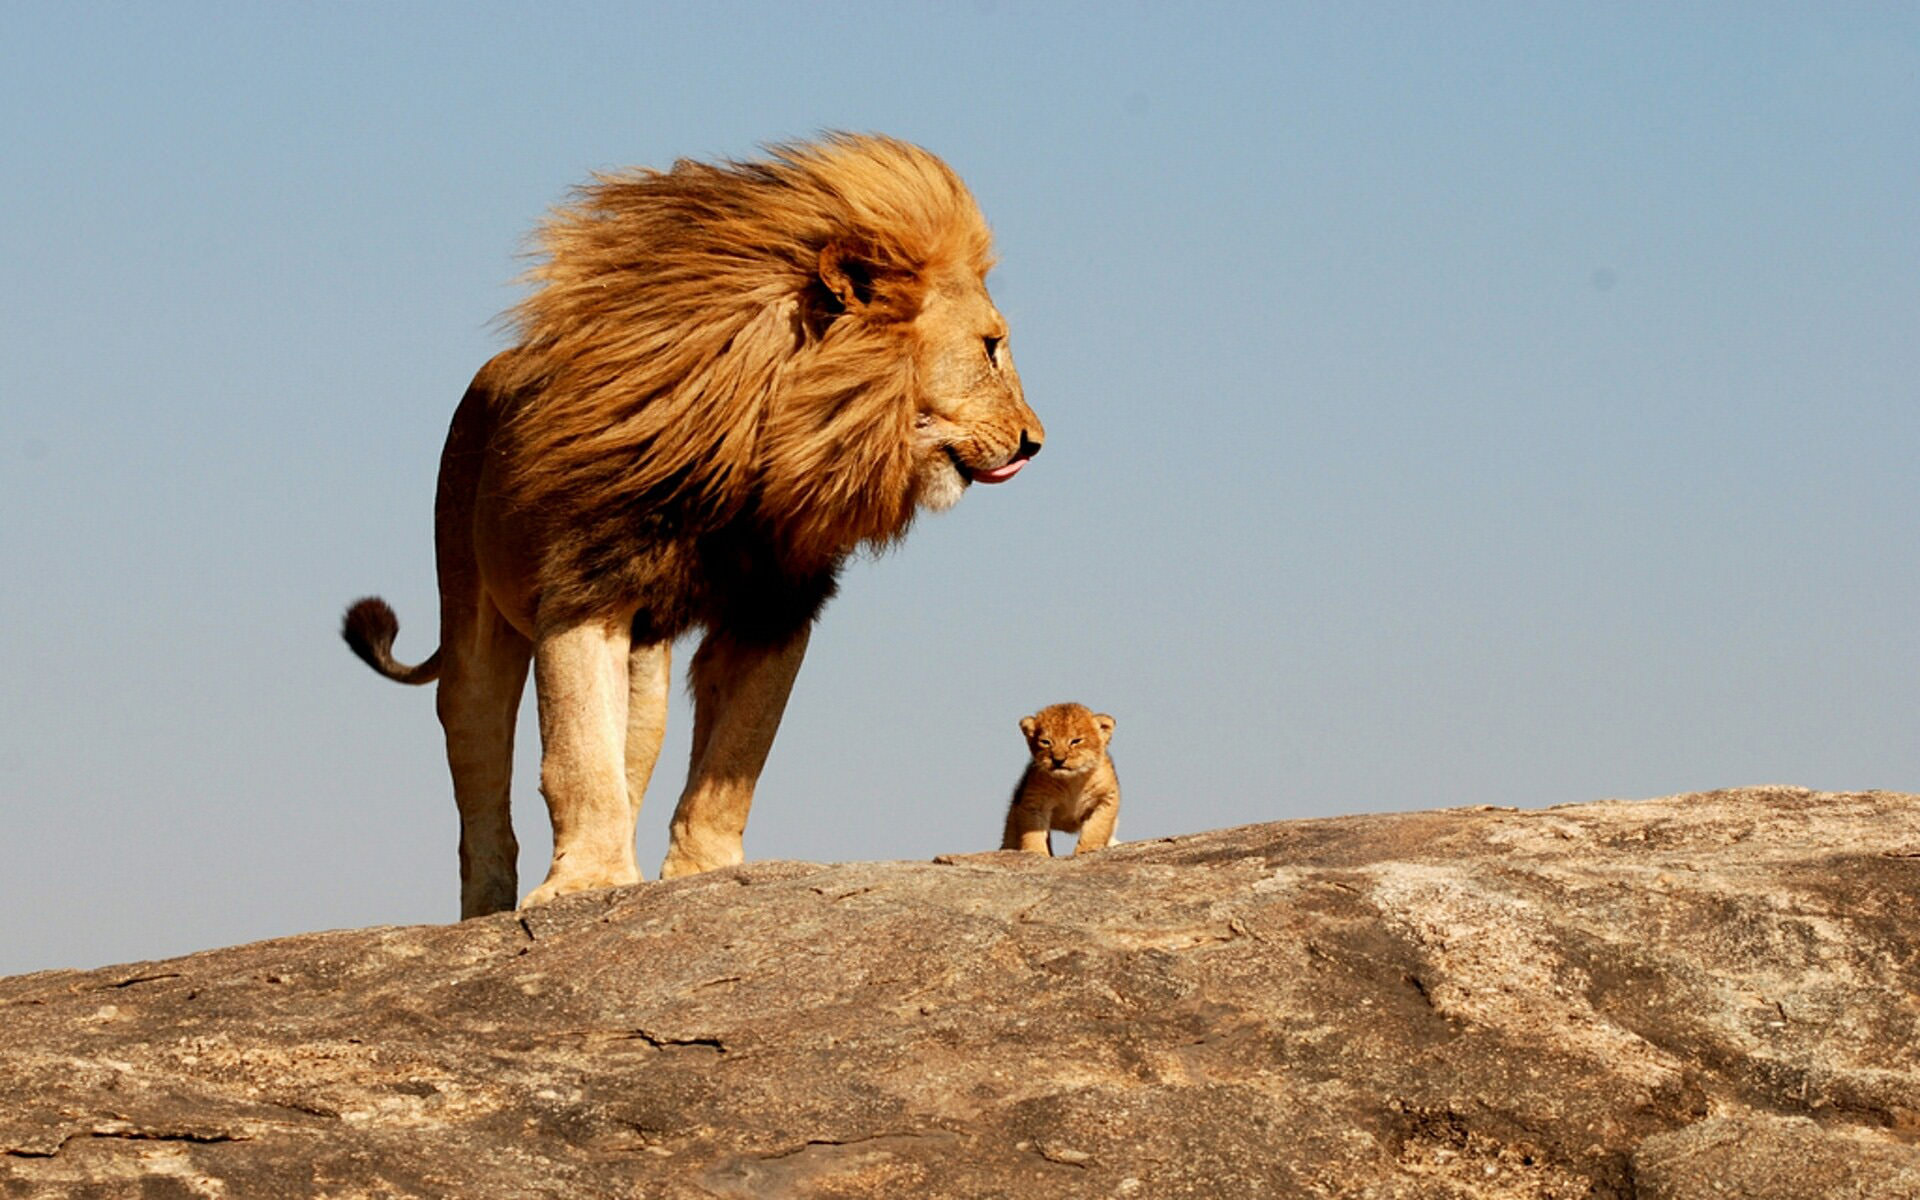 lion king 2 wallpaper mustafa mufasa